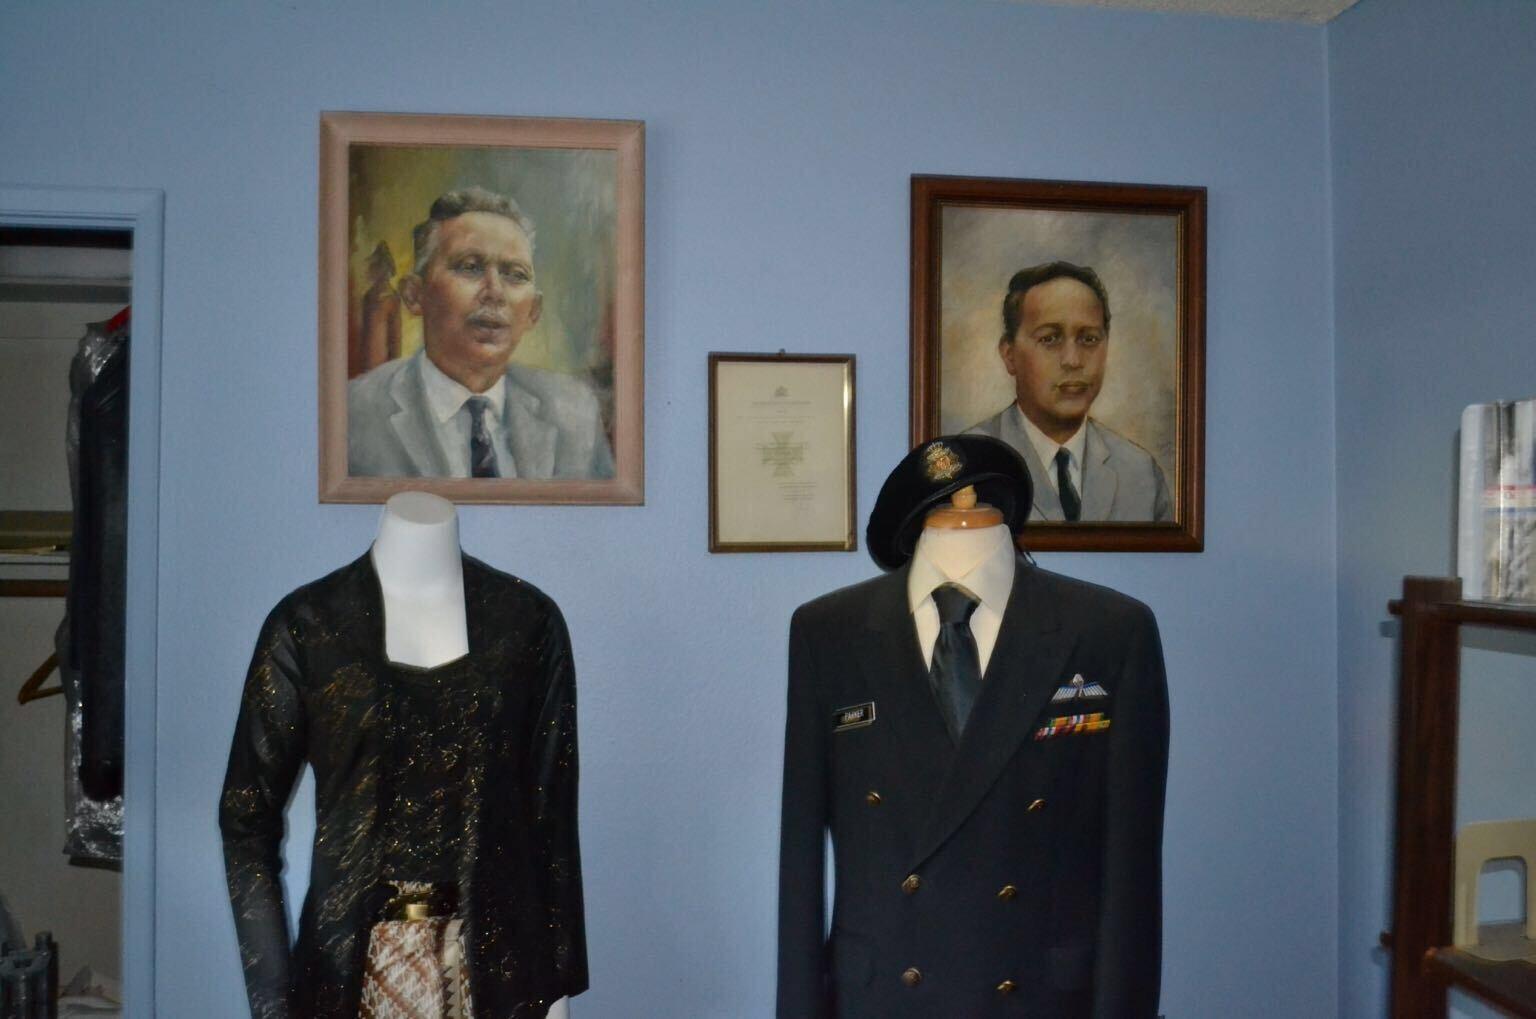 Portraits in Creutzburg Home